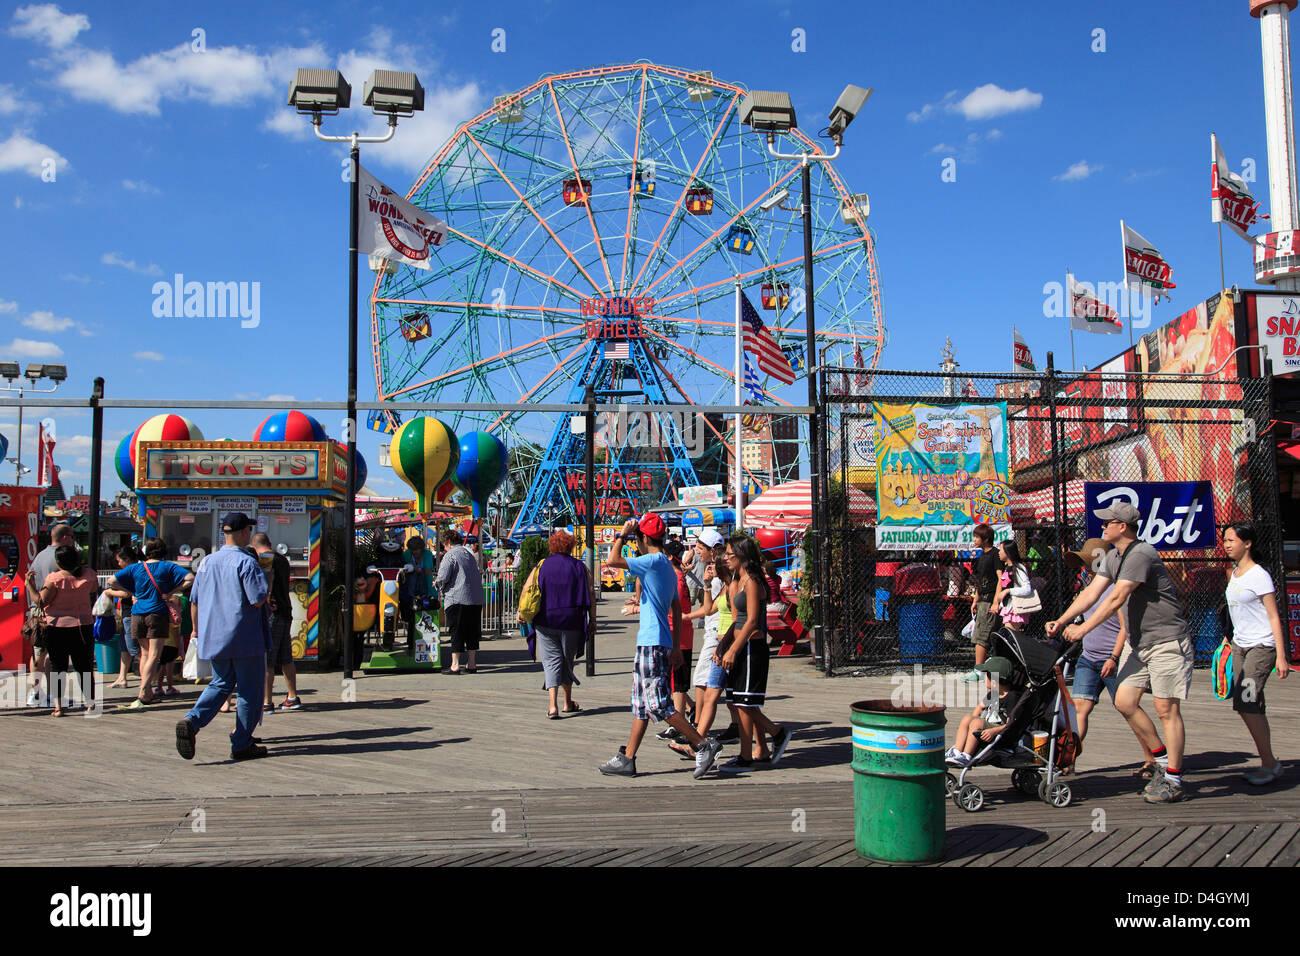 Boardwalk, Coney Island, Brooklyn, New York City, USA - Stock Image